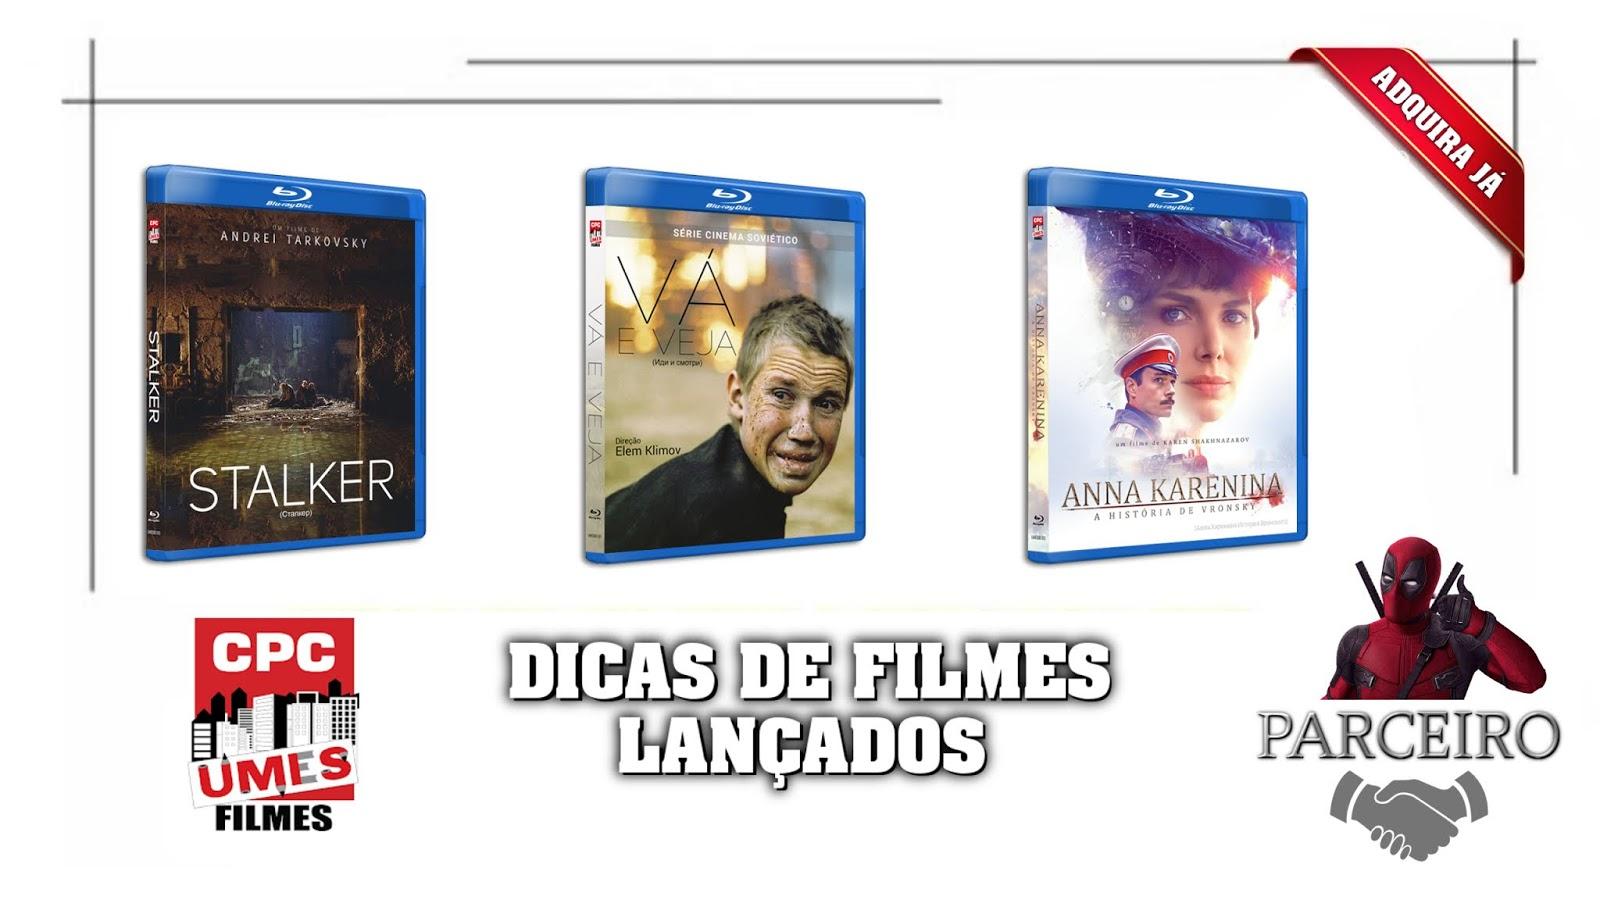 filmes-lancados-pela-cpc-umes-blu-ray